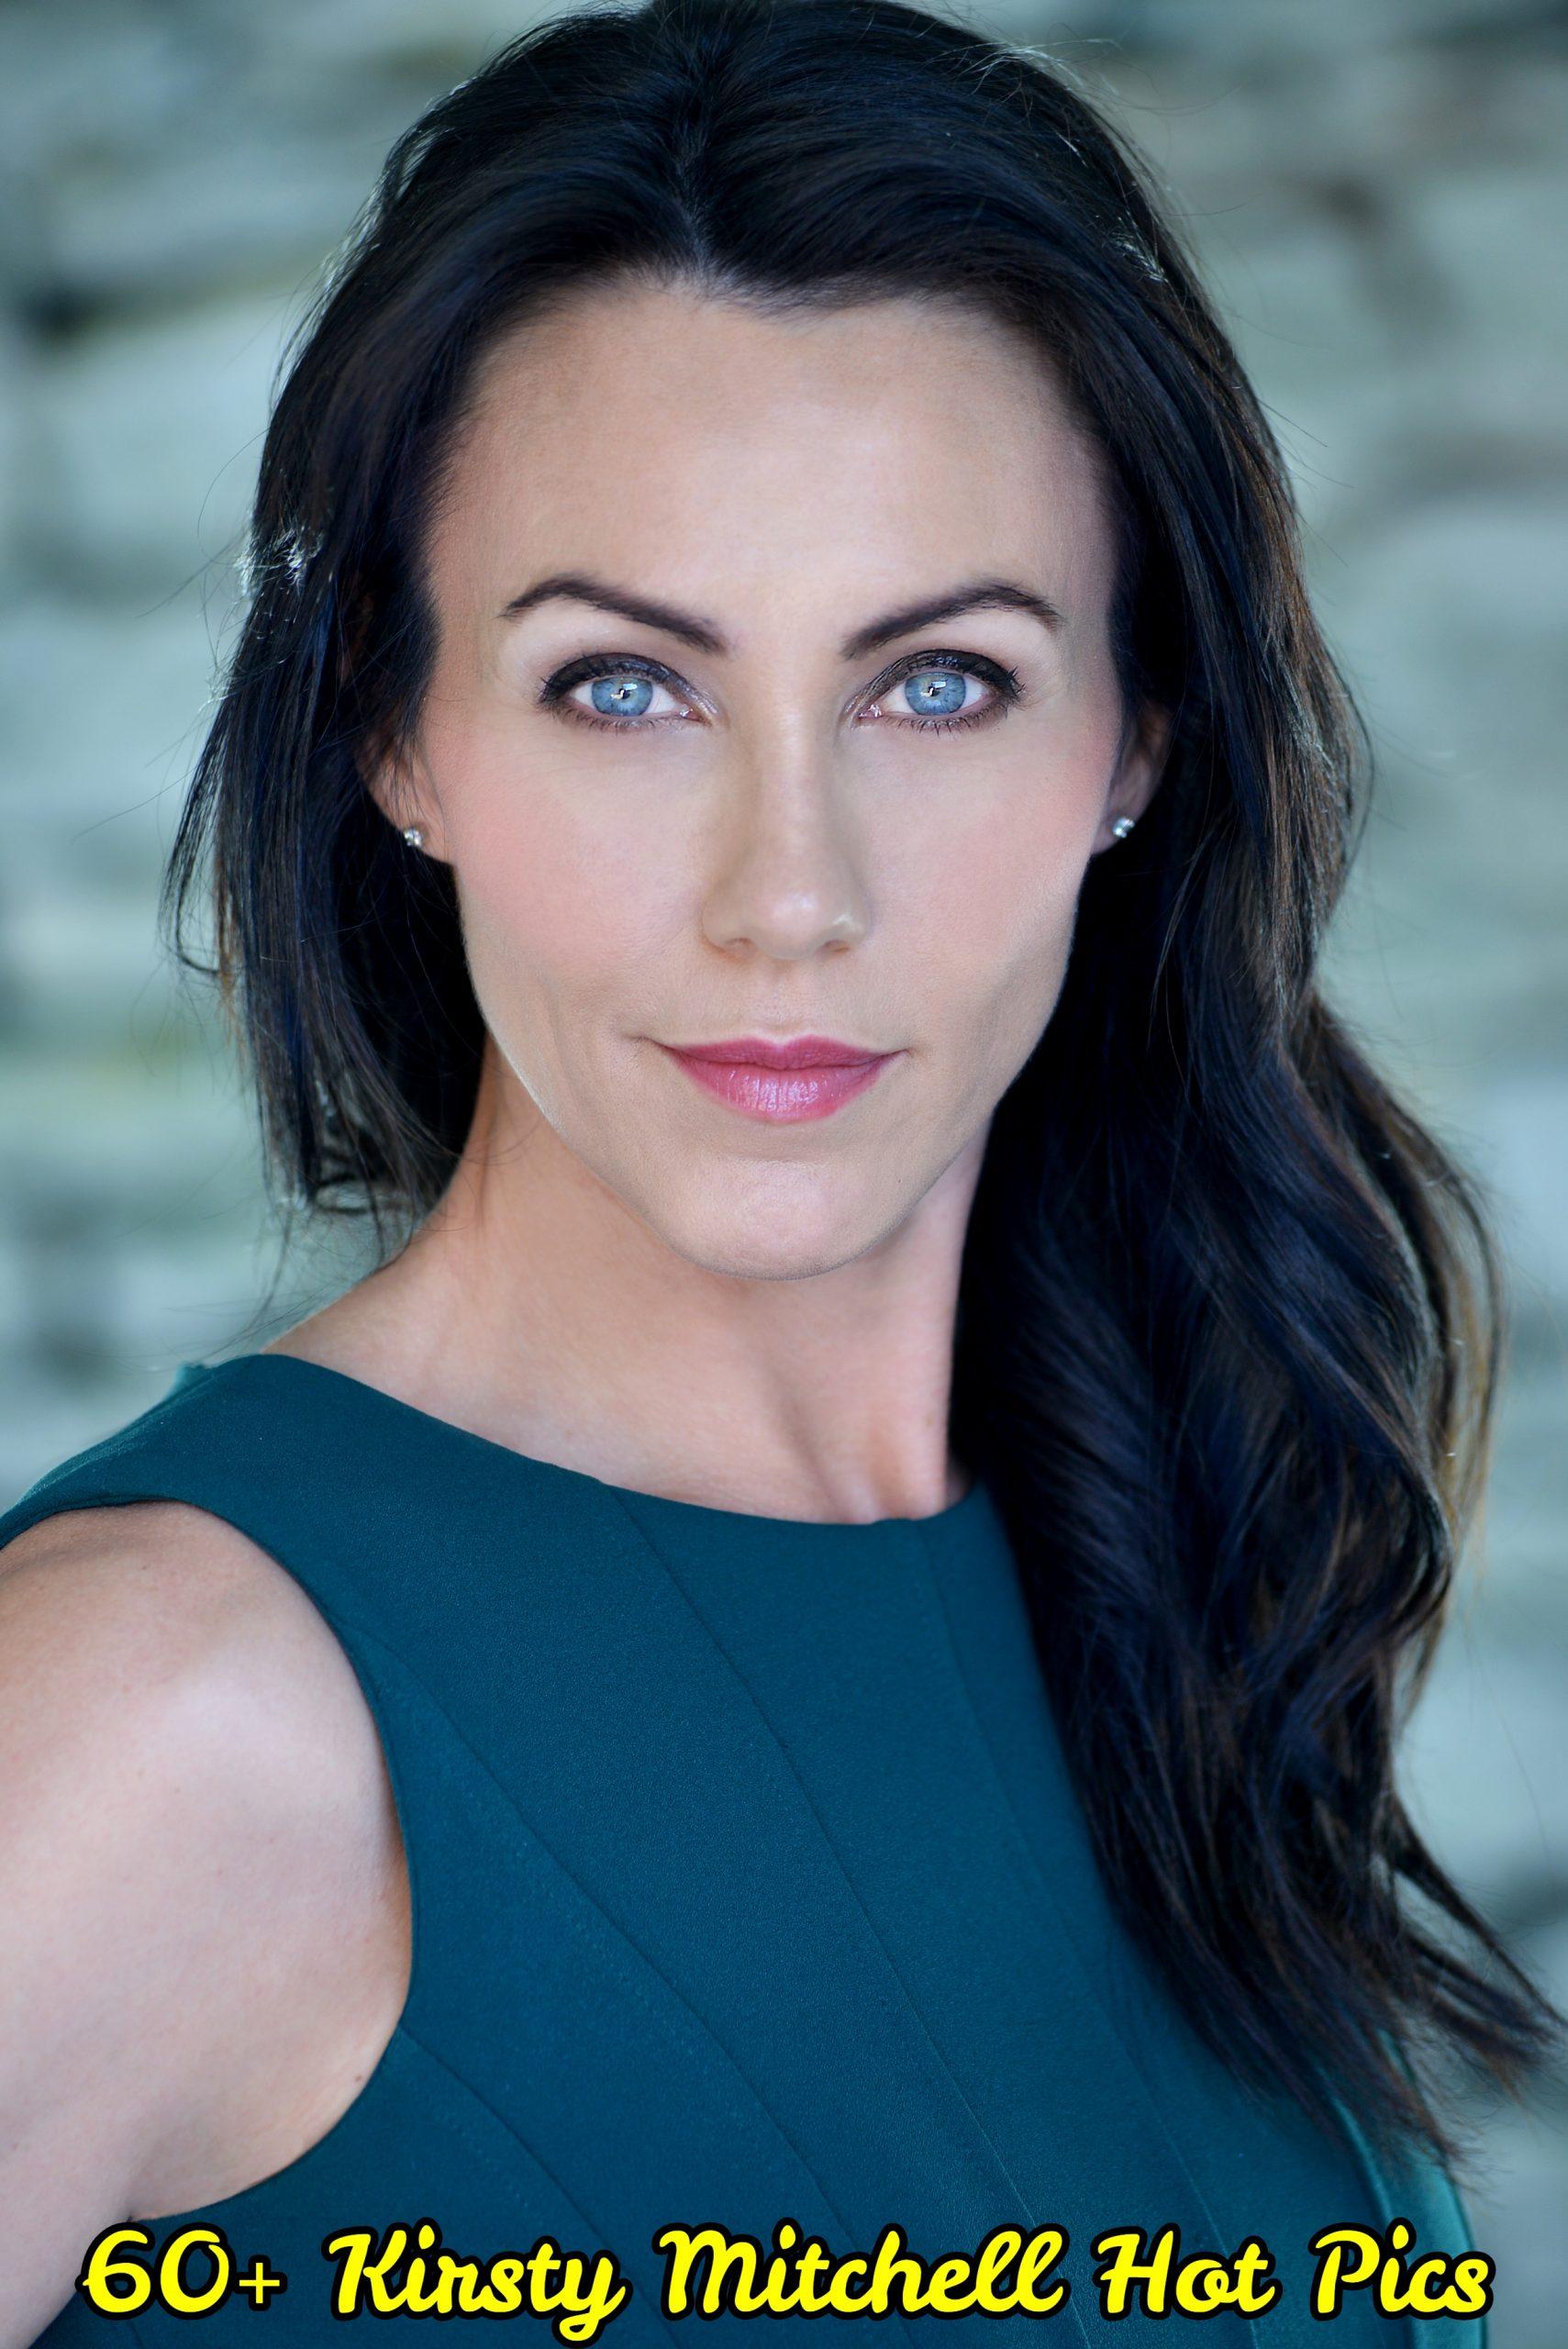 Kirsty Mitchell eyes